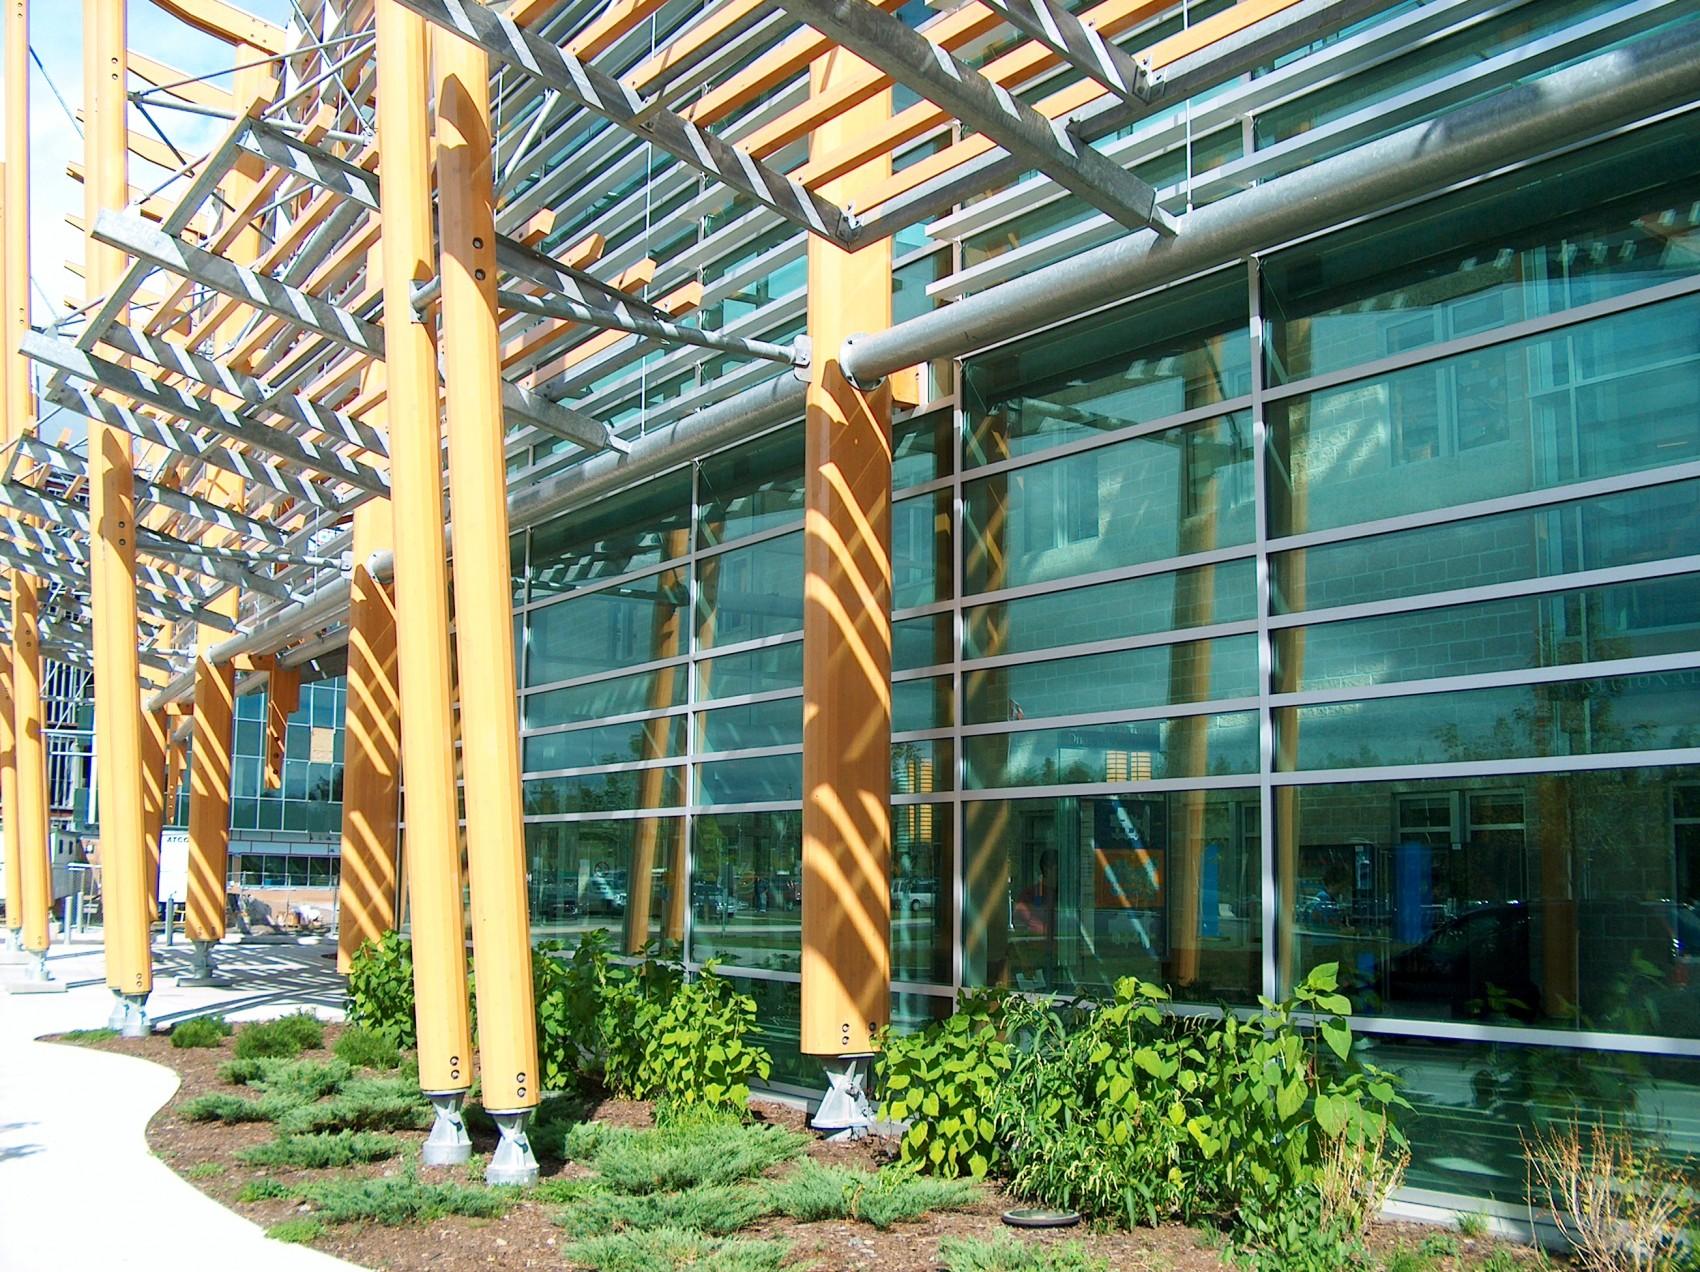 Thunder-Bay-Regional-Hospital-021-1700x1272